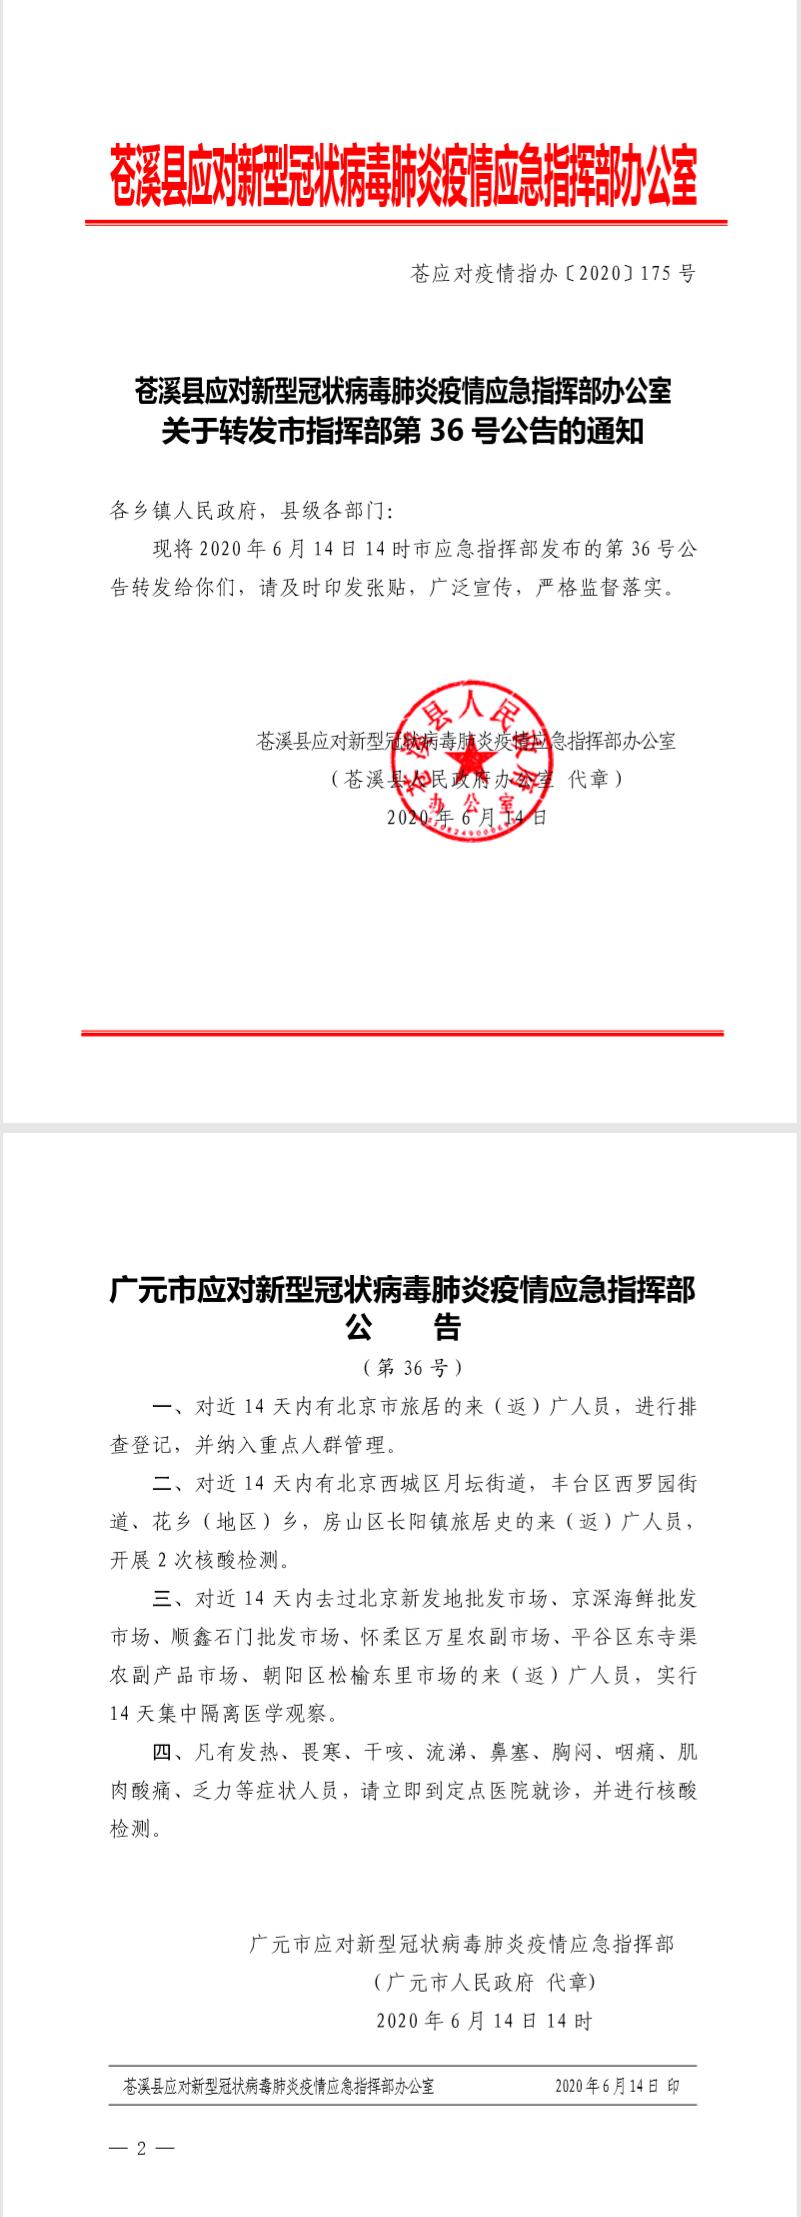 QQ截图20200616171959.png